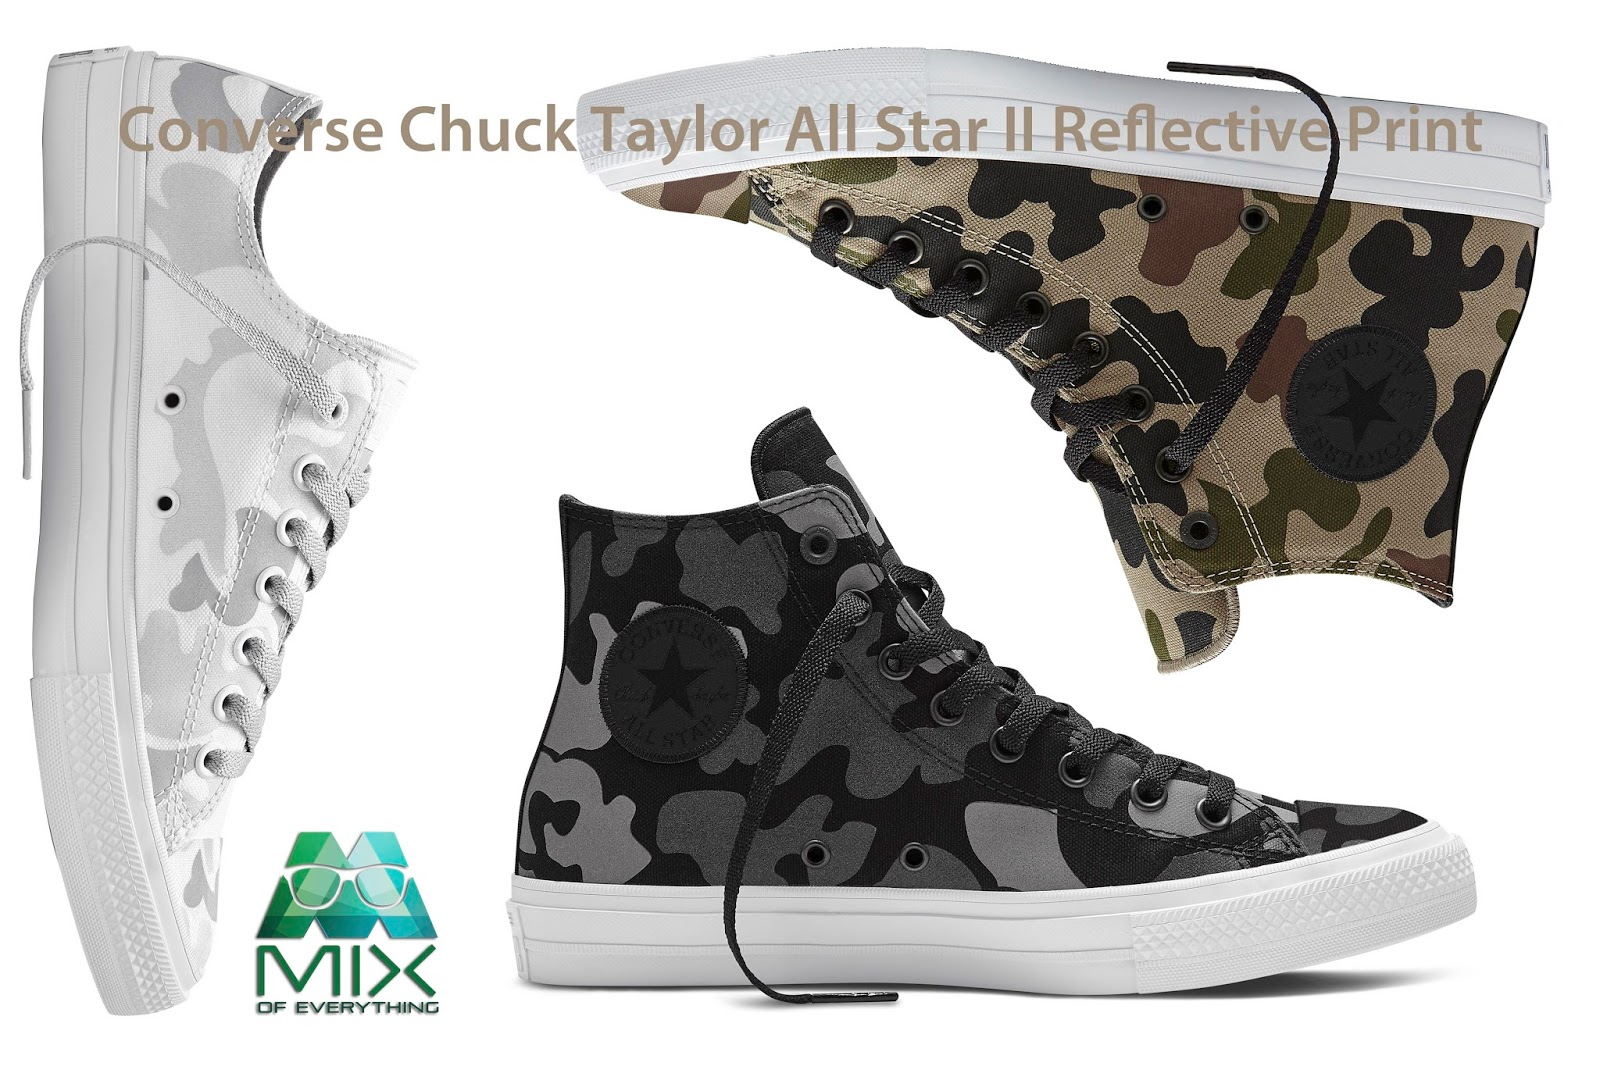 446f33c07c6bf6 Converse Chuck Taylor All Star II Reflective Print - Hello! Welcome ...